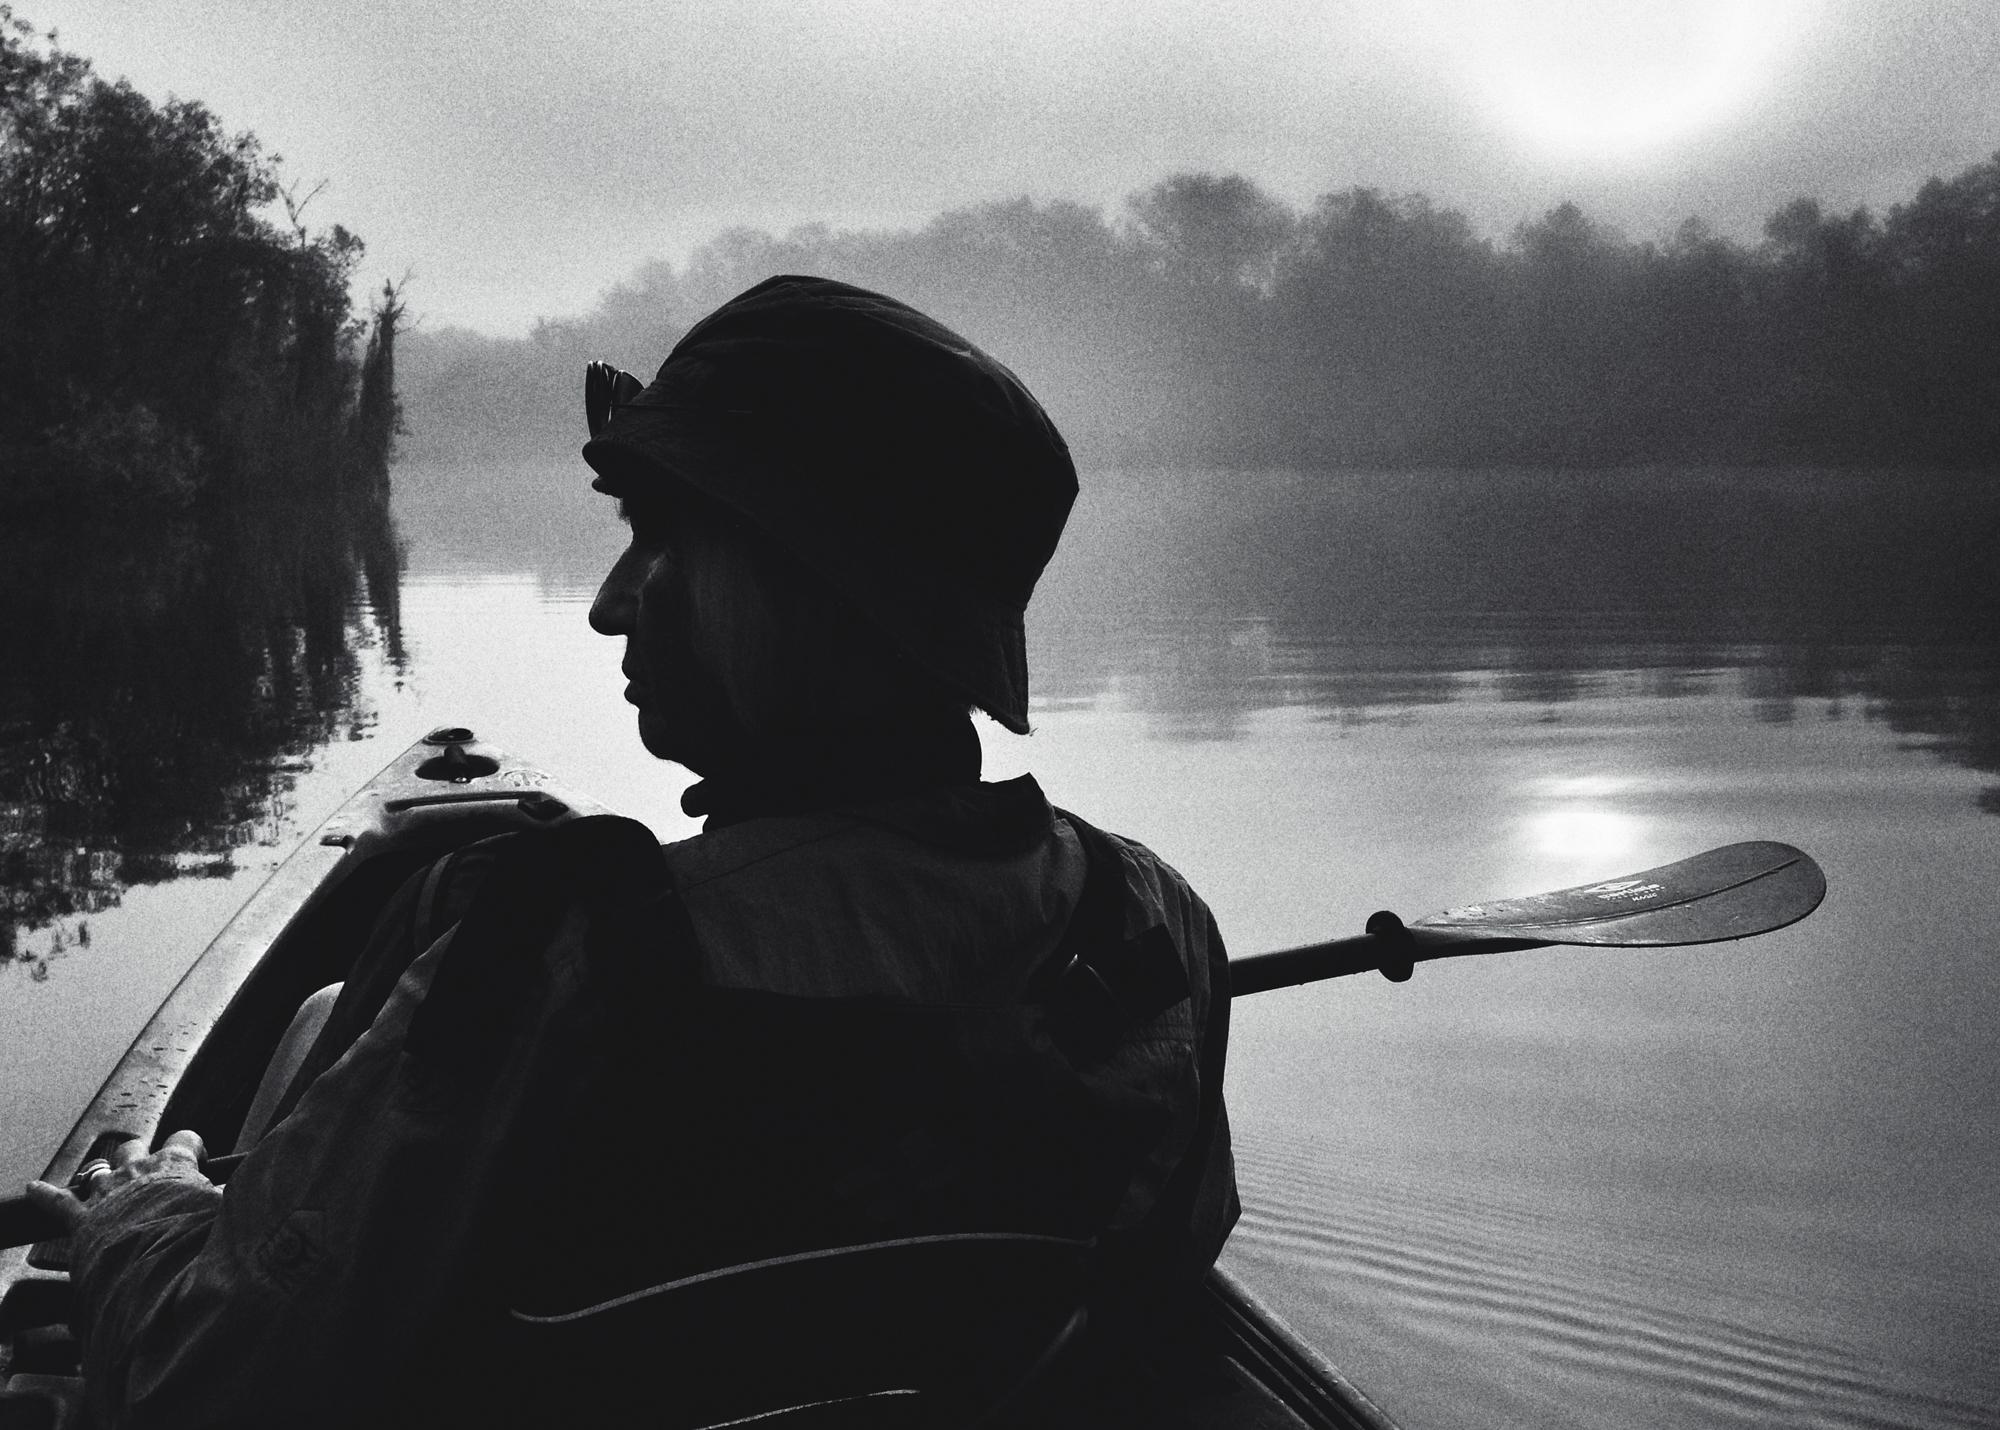 Mary Ann on sunrise canoe trip on Turner River, FL